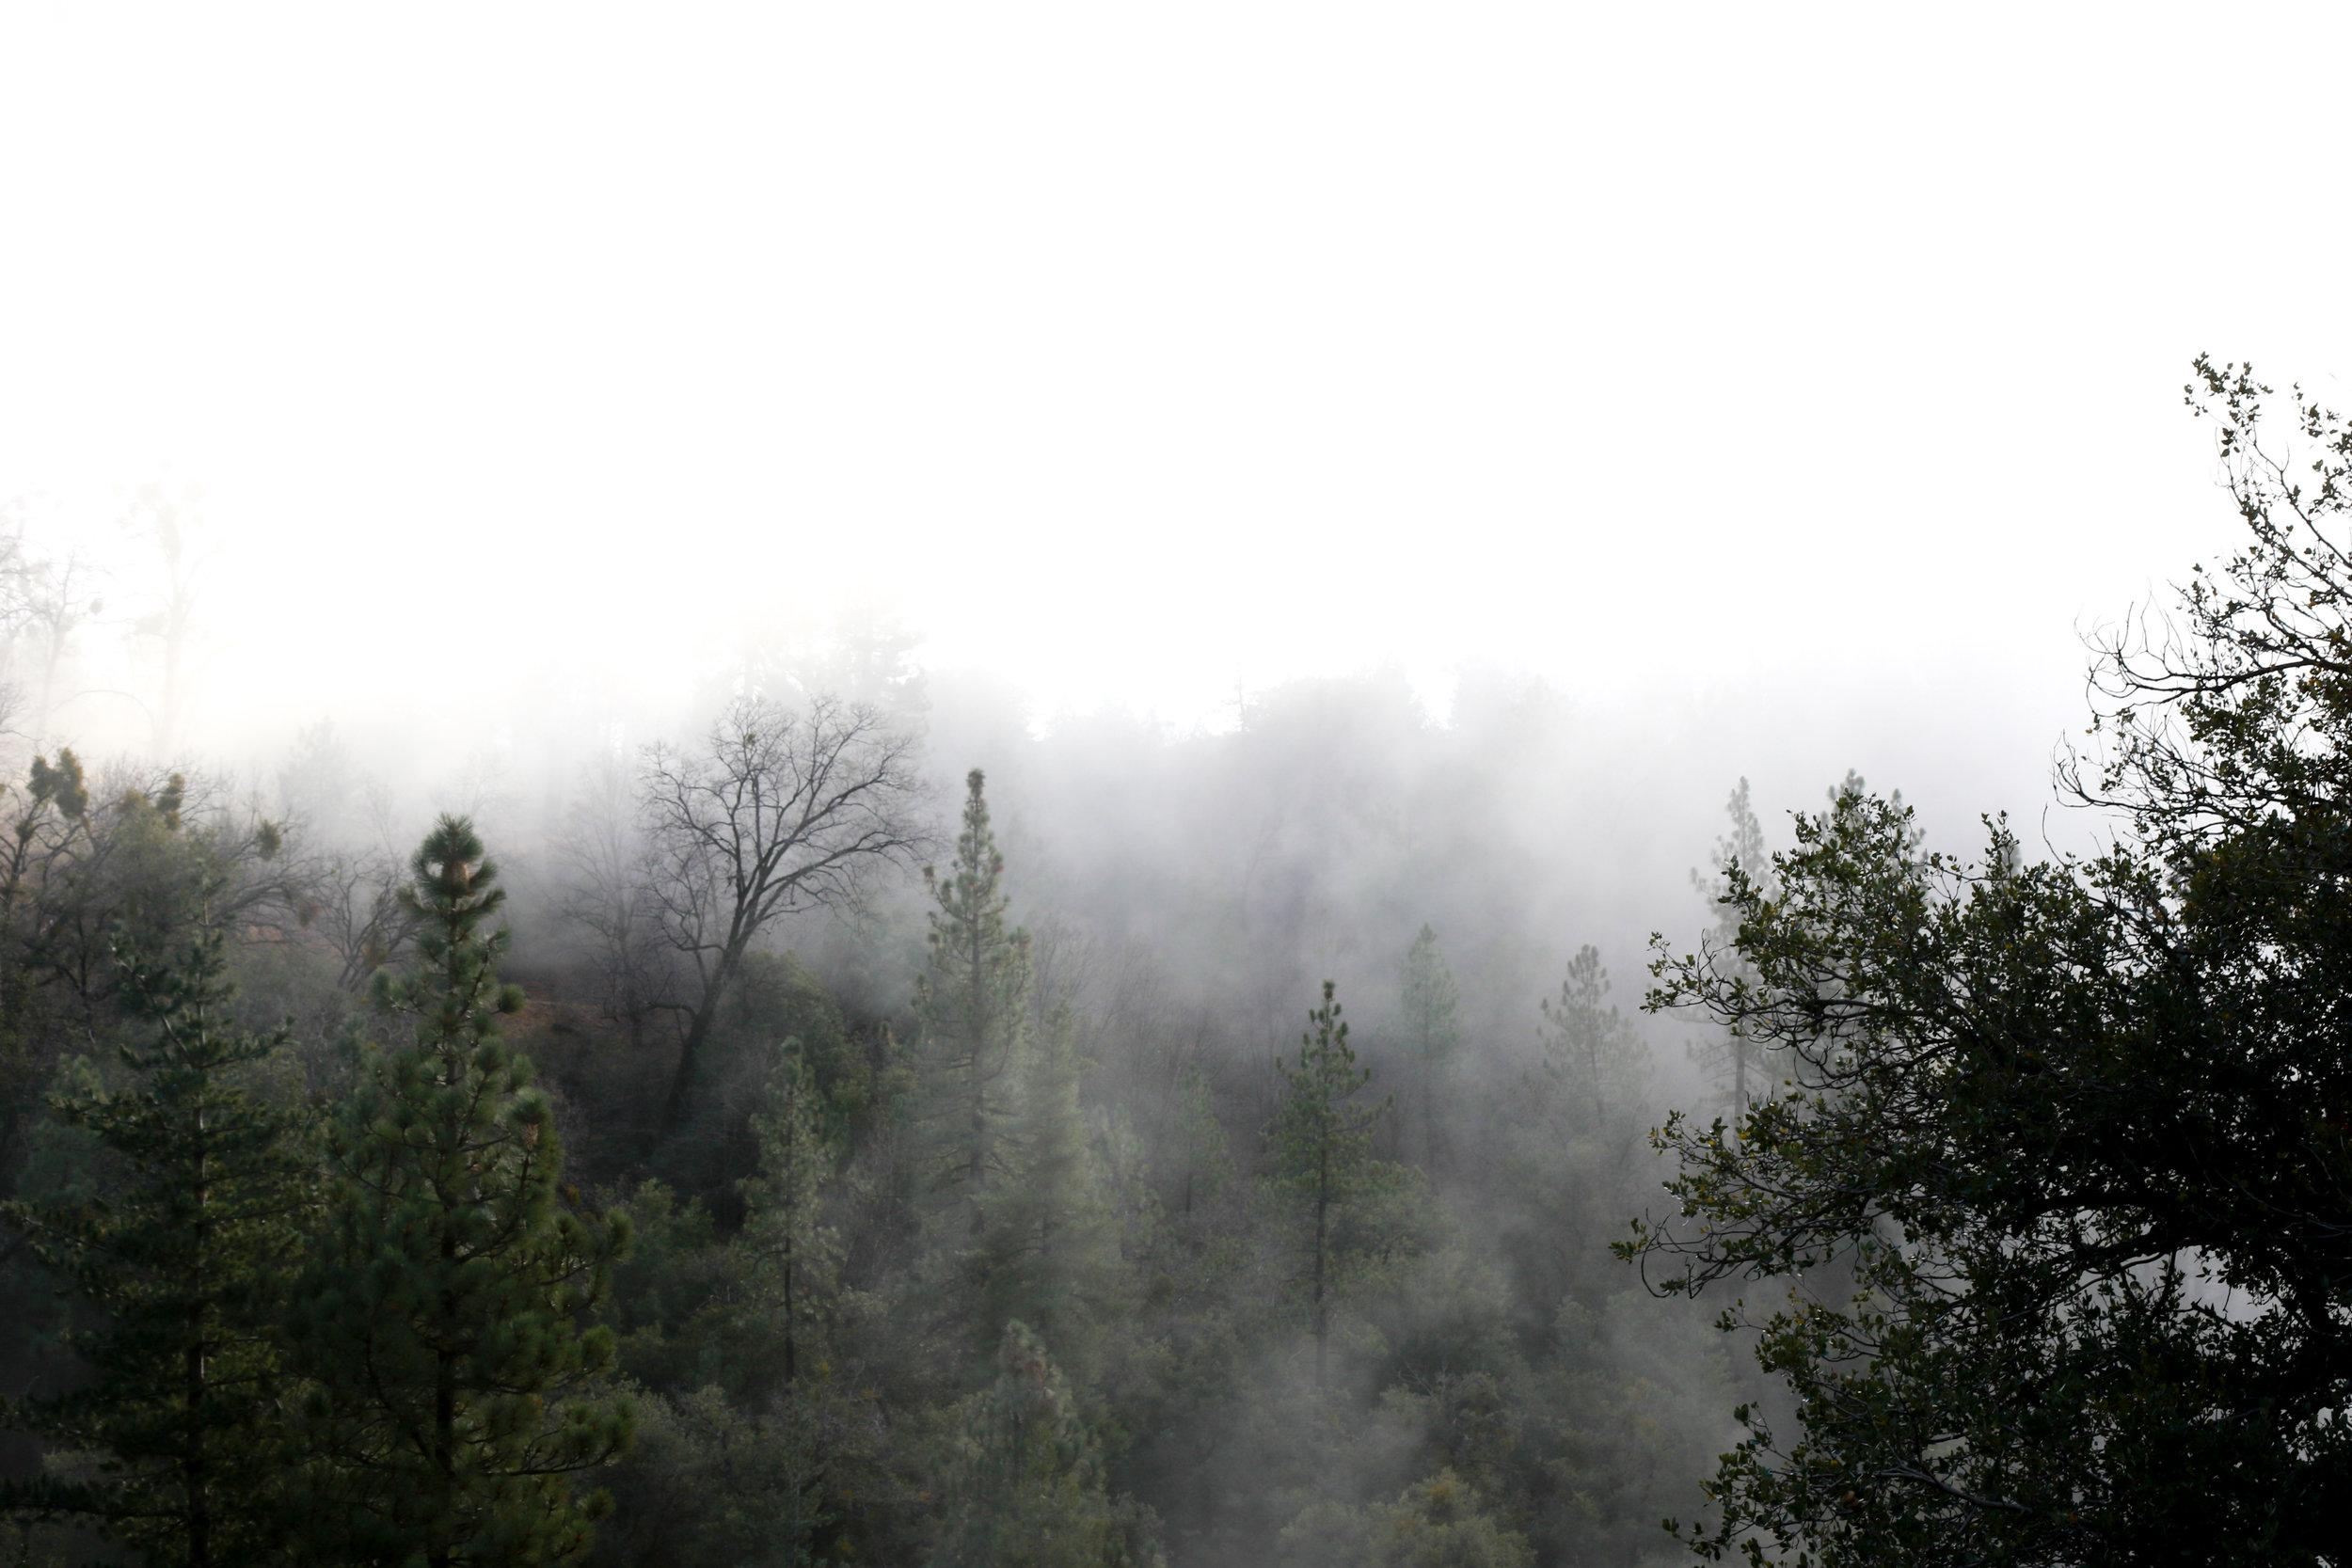 Cloud Forest - Holli Z Photography - 1.jpg